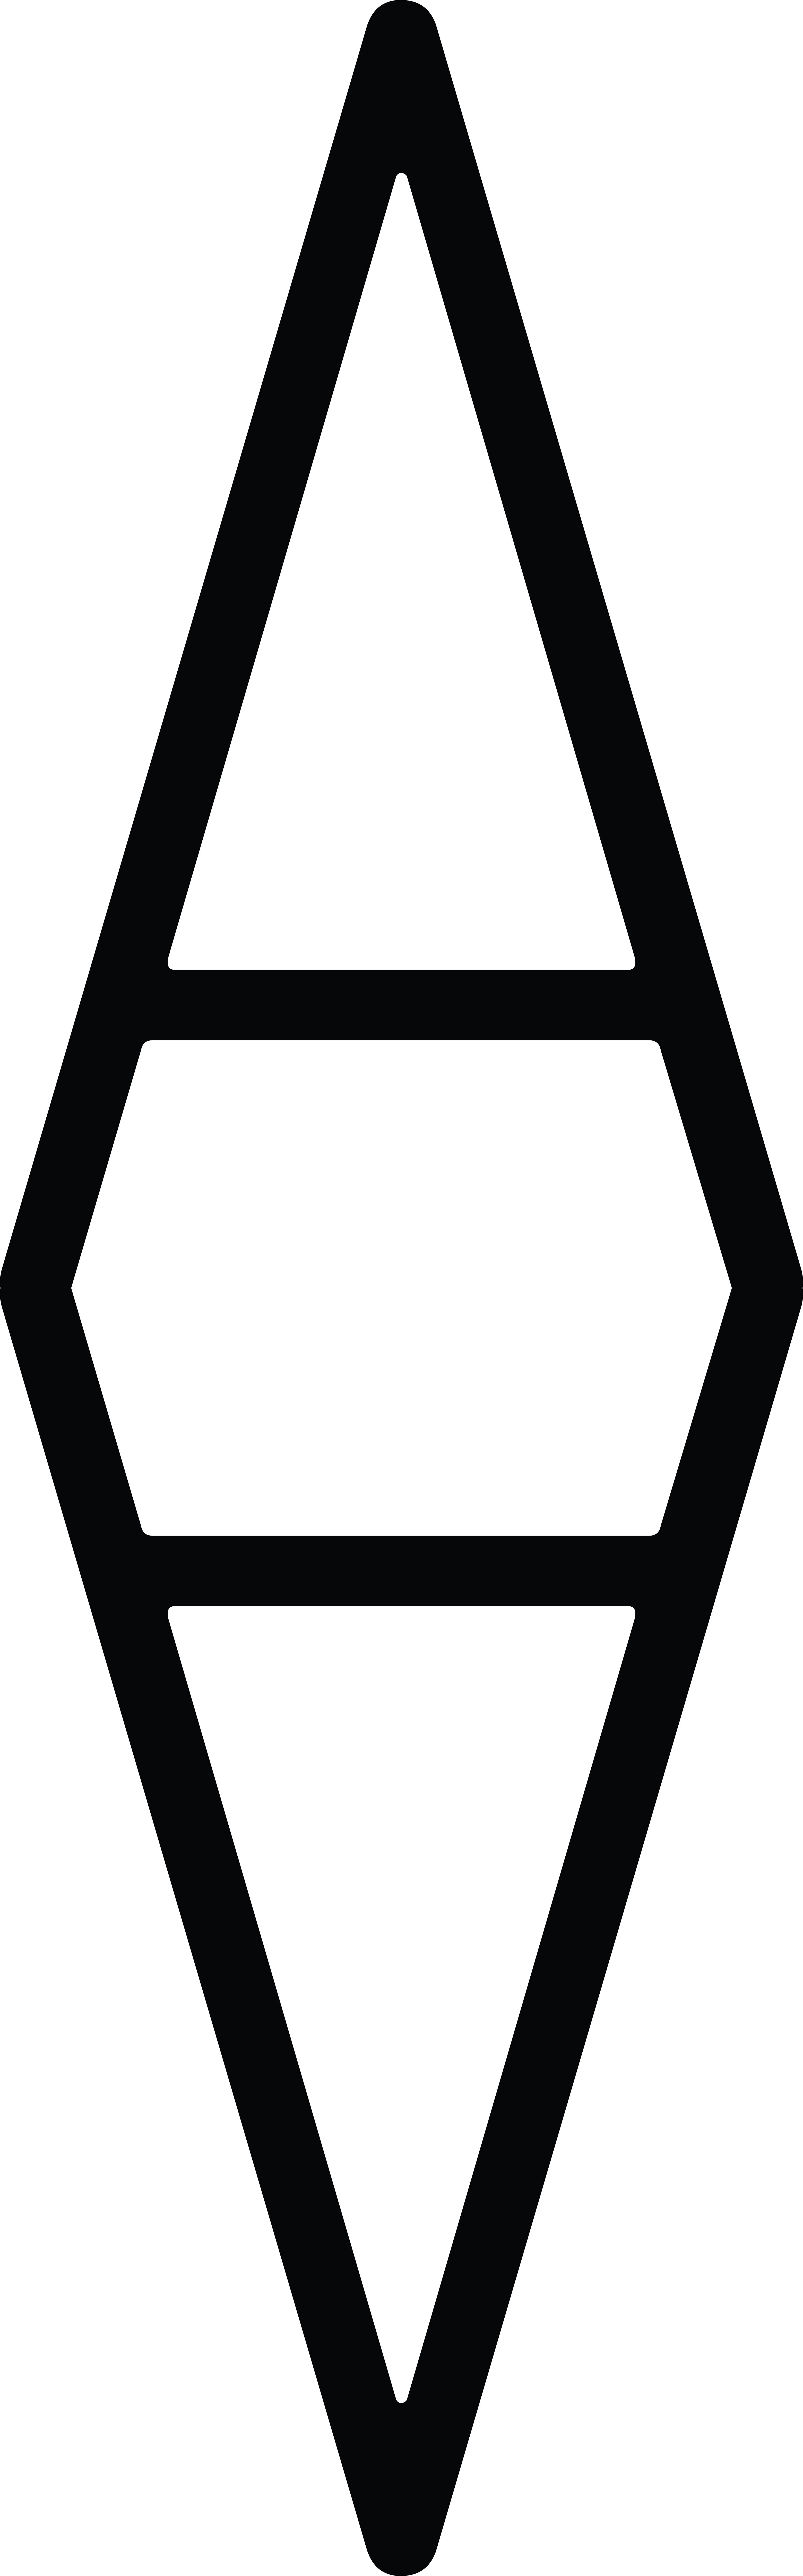 Logo_Embargo_Design_Mobilier.JPG